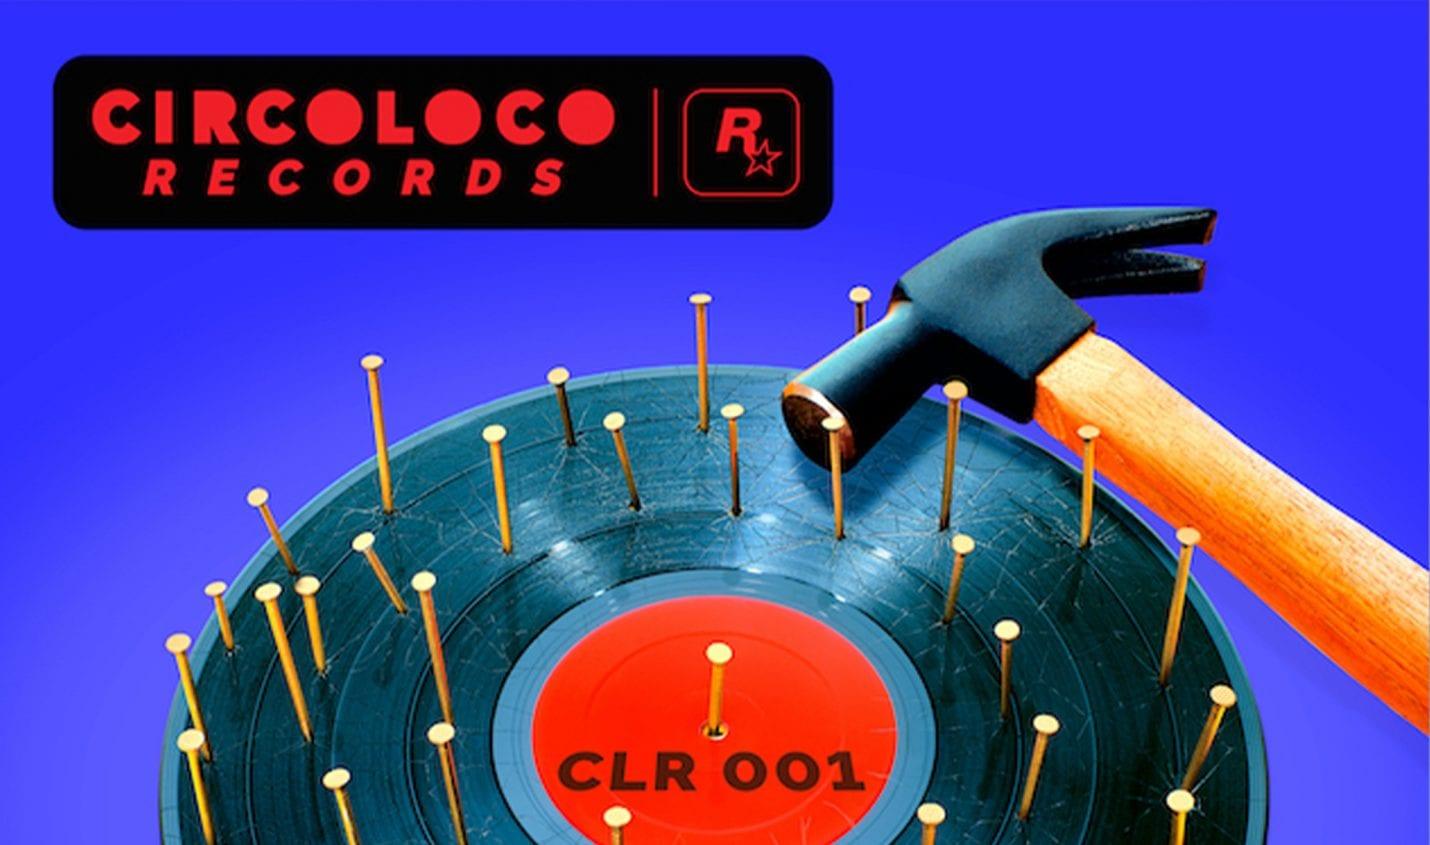 Rockstar Games: Neues Plattenlabel in Kooperation mit Circoloco